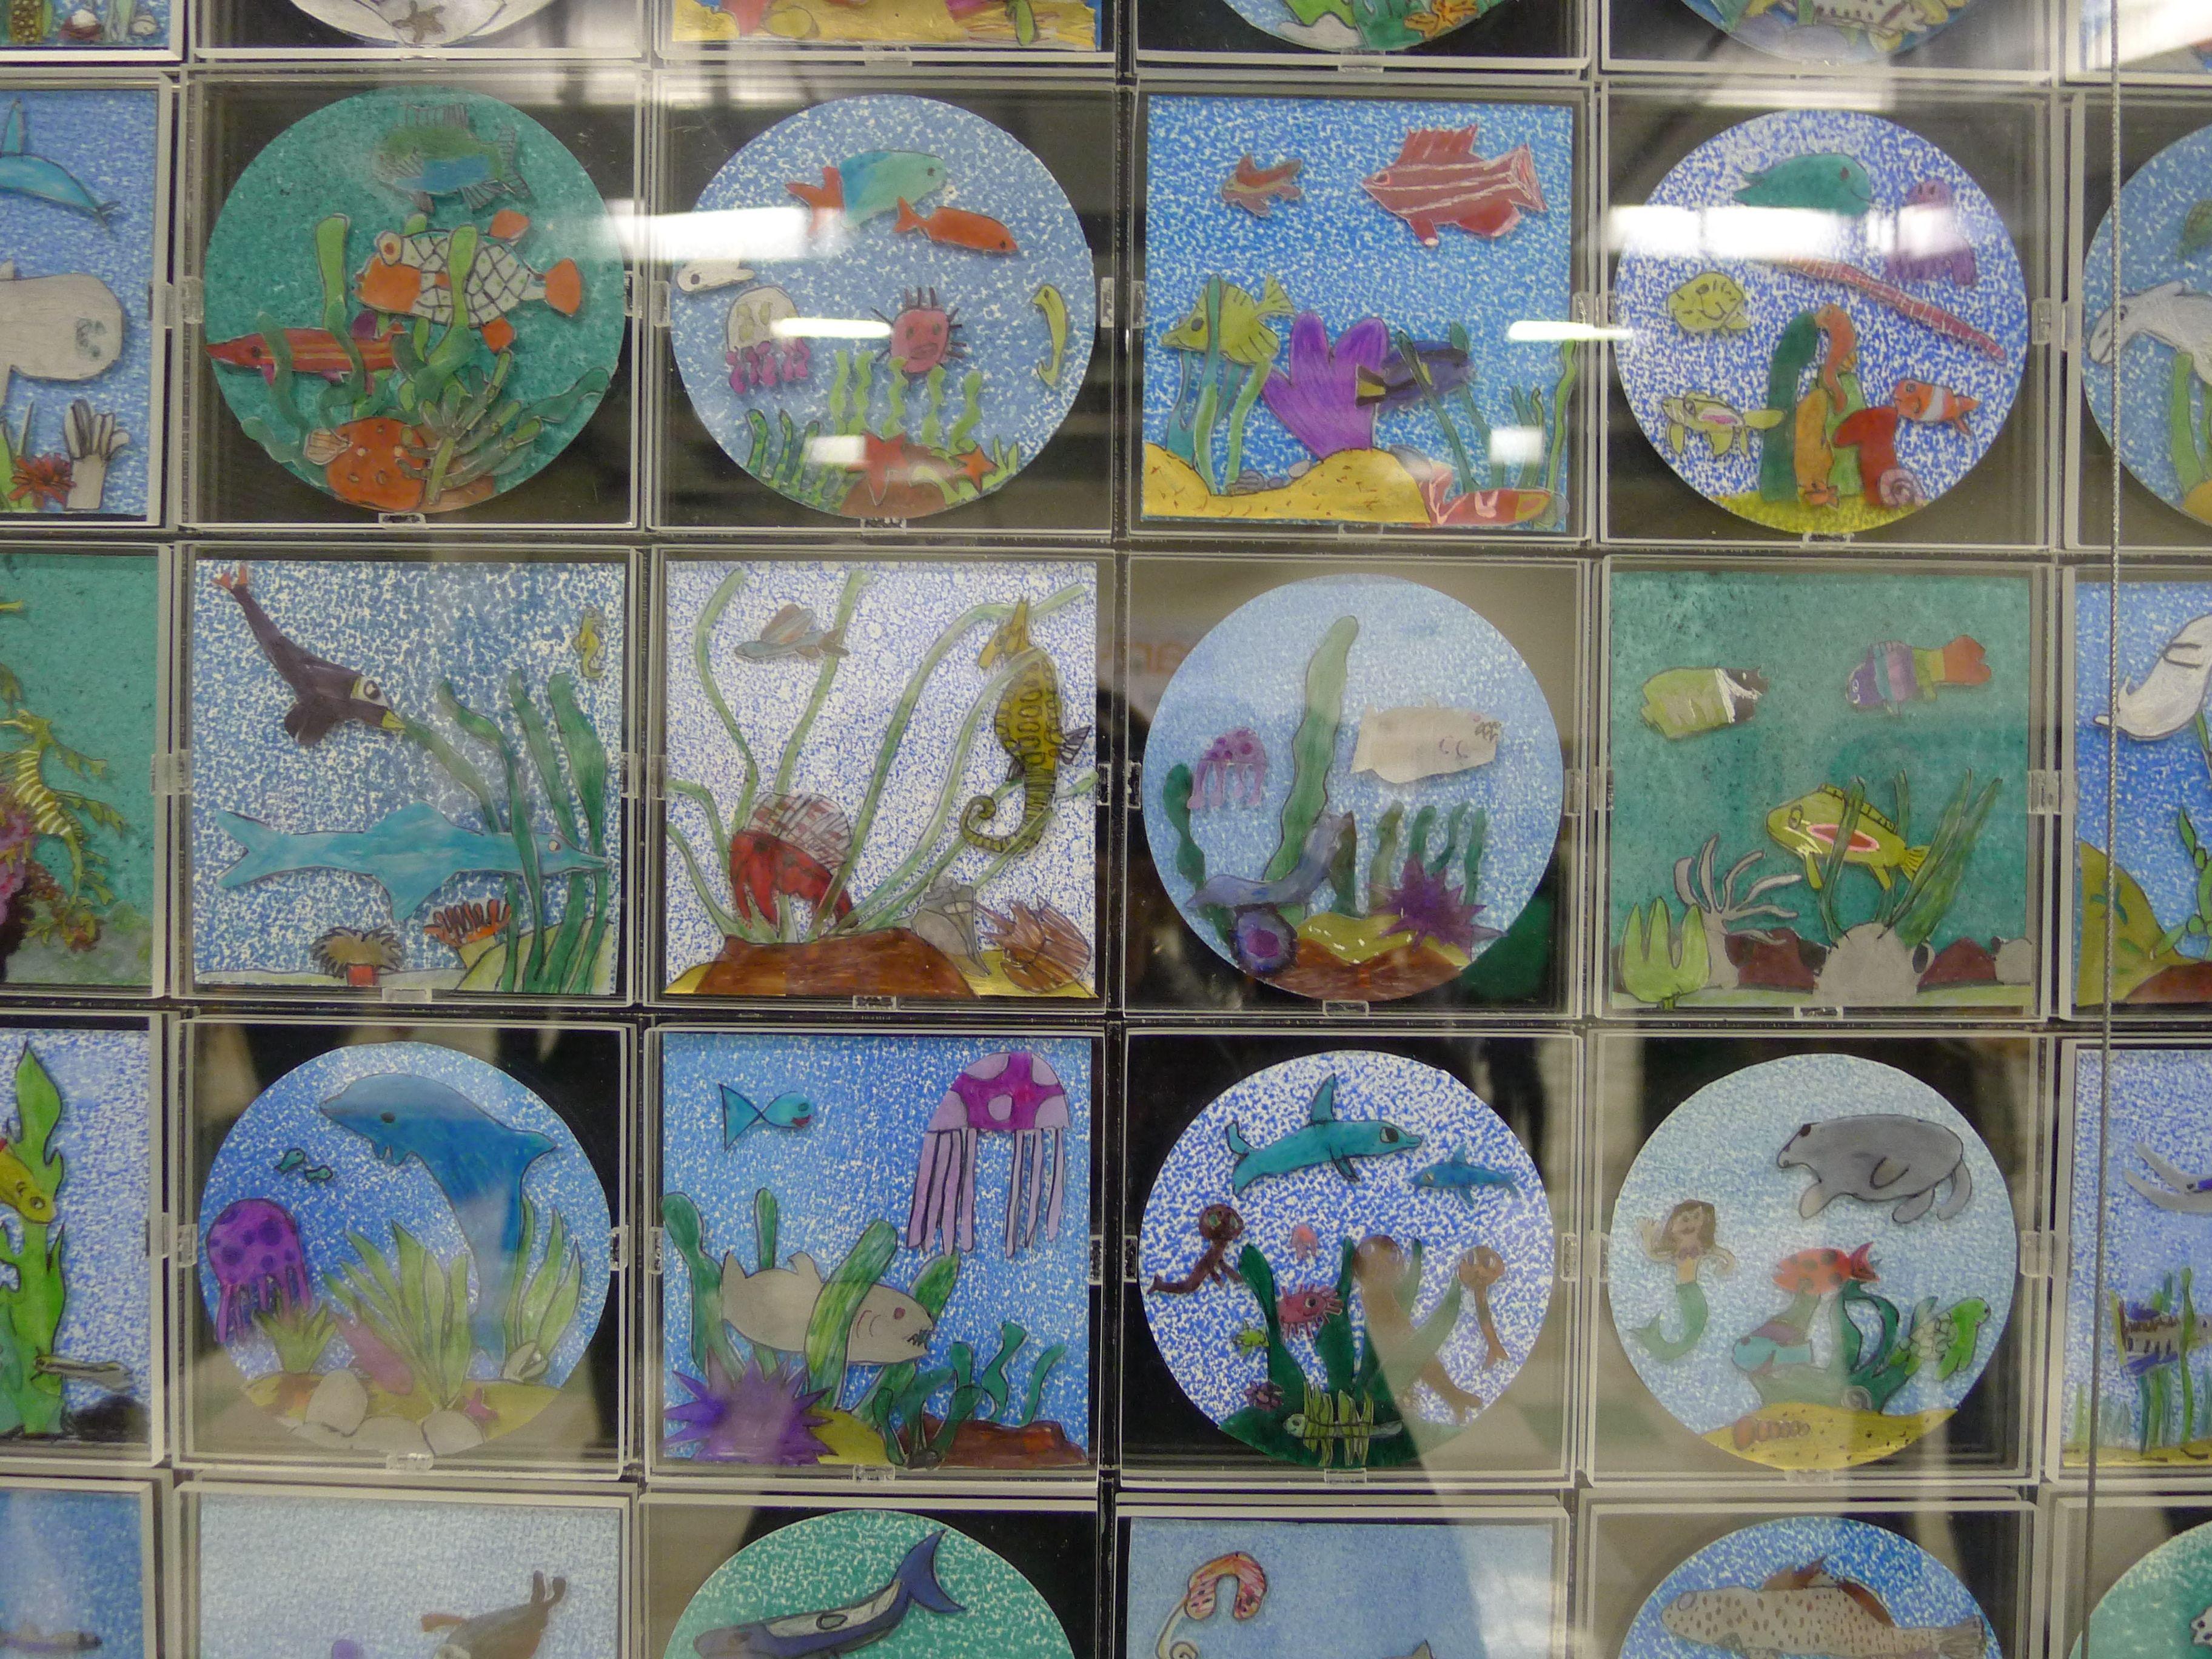 Classroom Art Ideas ~ A treasure trove of wonders the willows school class art